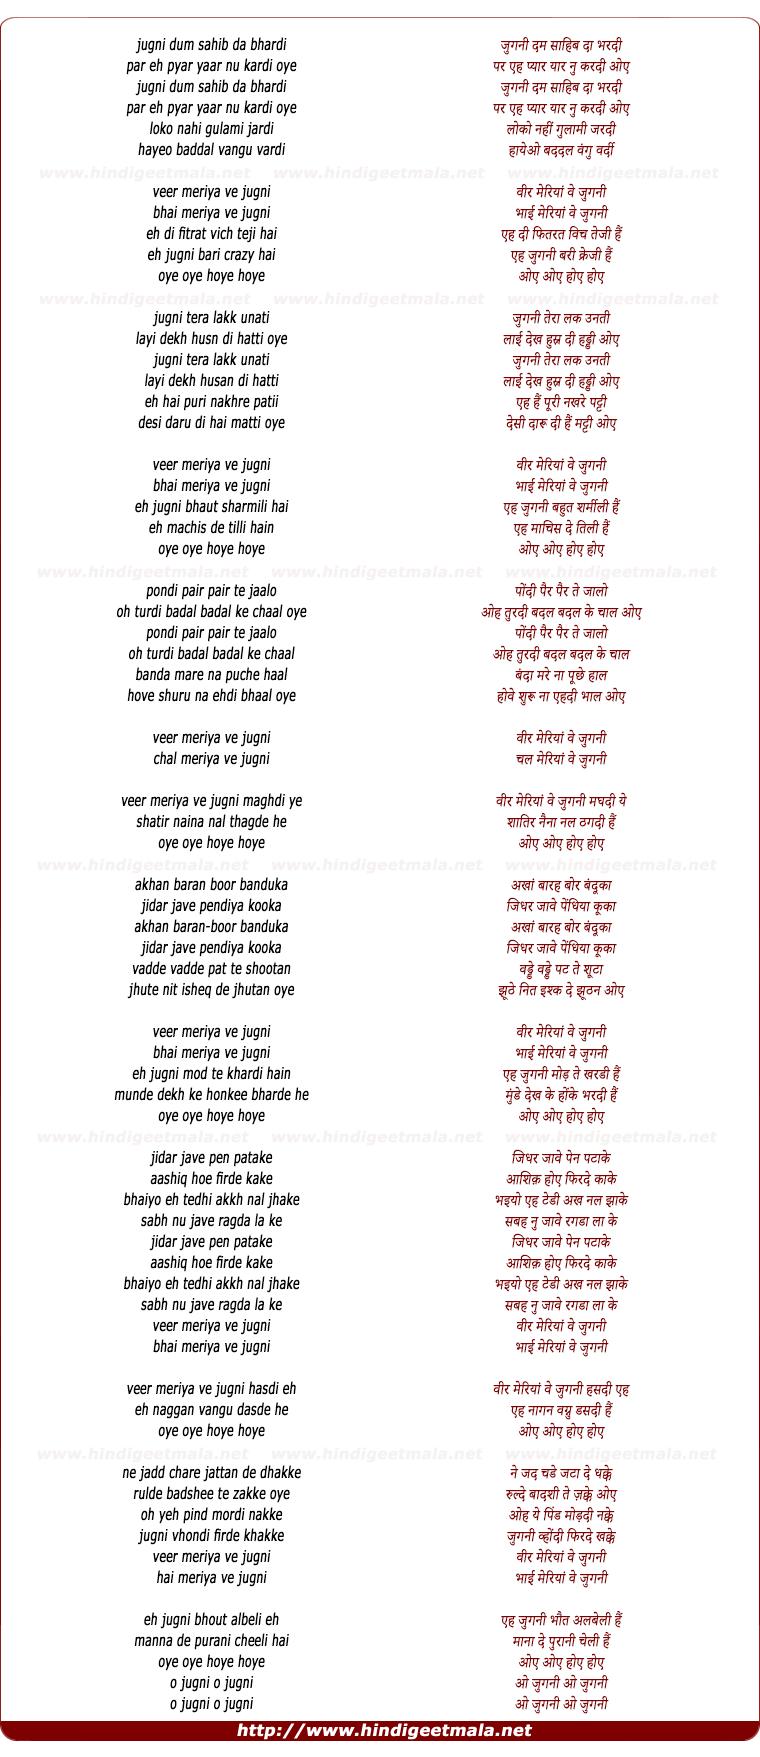 lyrics of song Eh Jugni Bari Crazy Hai